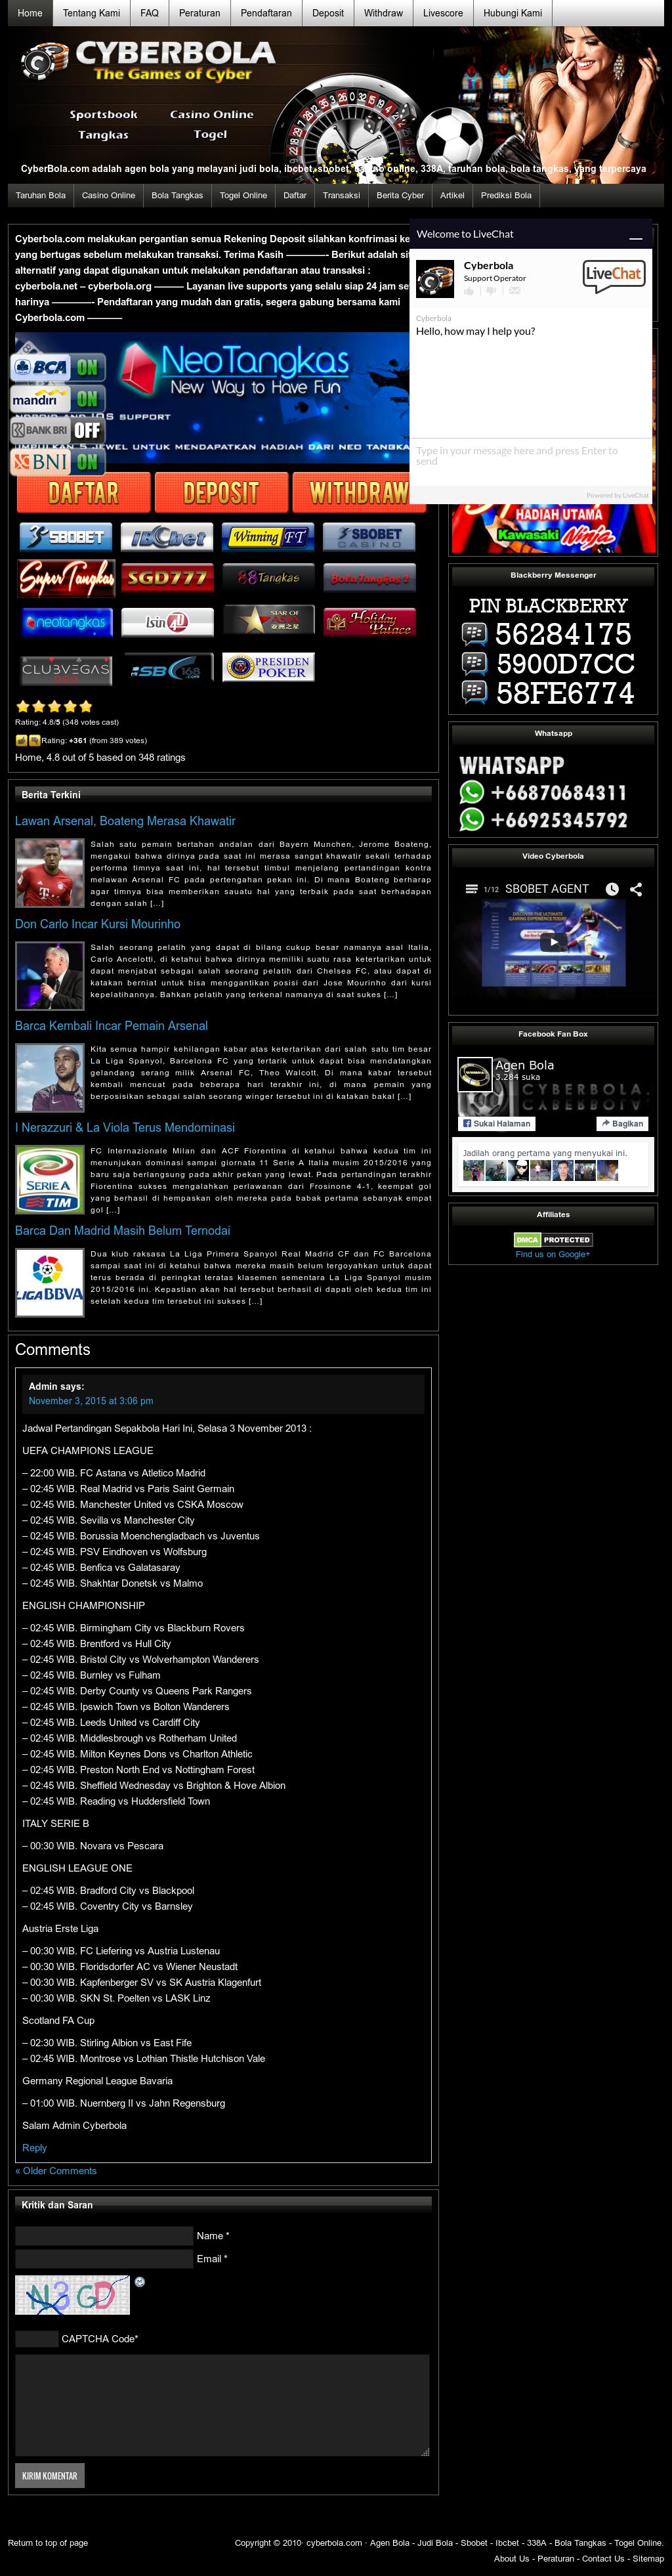 Owler Reports Press Release Cyberbola Cyberbola